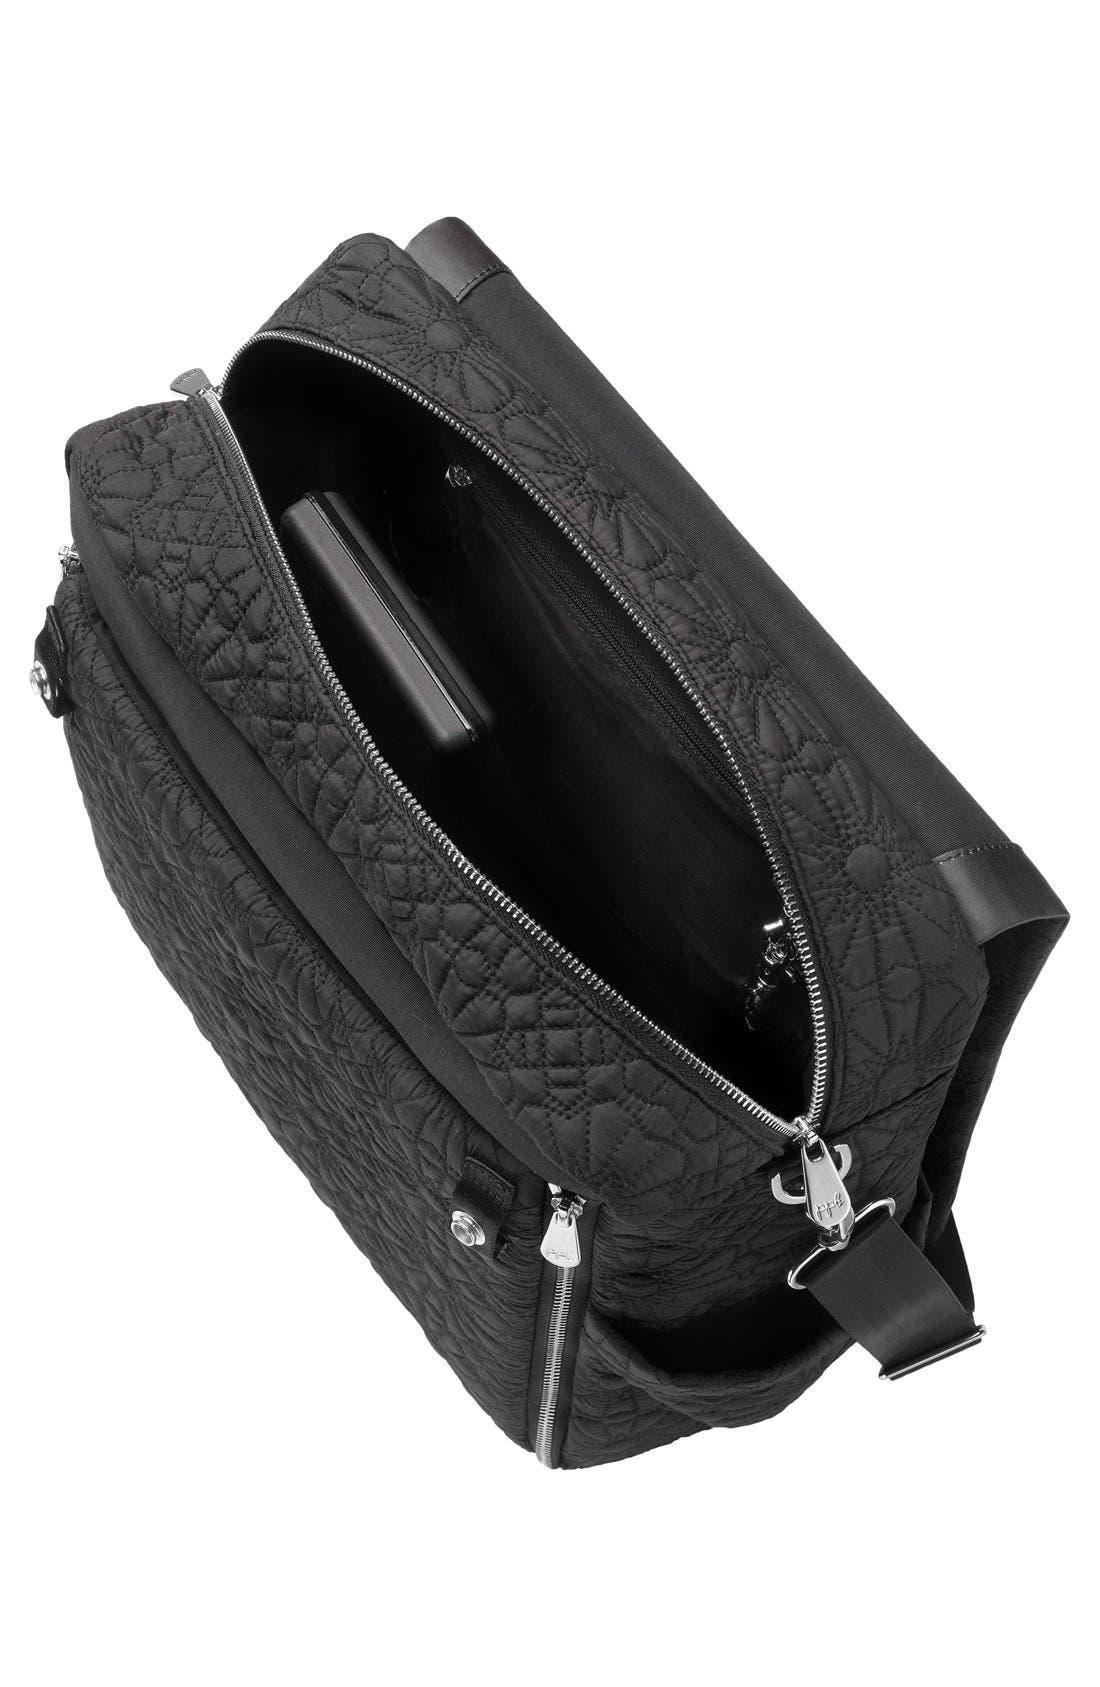 'Embossed Boxy' Backpack Diaper Bag,                             Alternate thumbnail 6, color,                             002